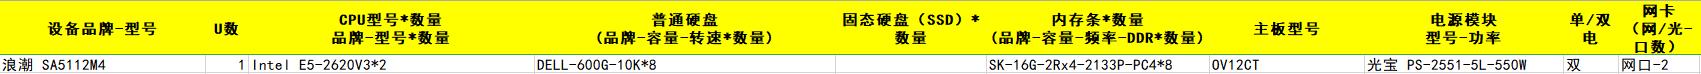 浪潮 SA5112M4 Intel E5-2620V3*2 DELL-600G-10K*8 SK-16G-2Rx4-2133P-PC4*8